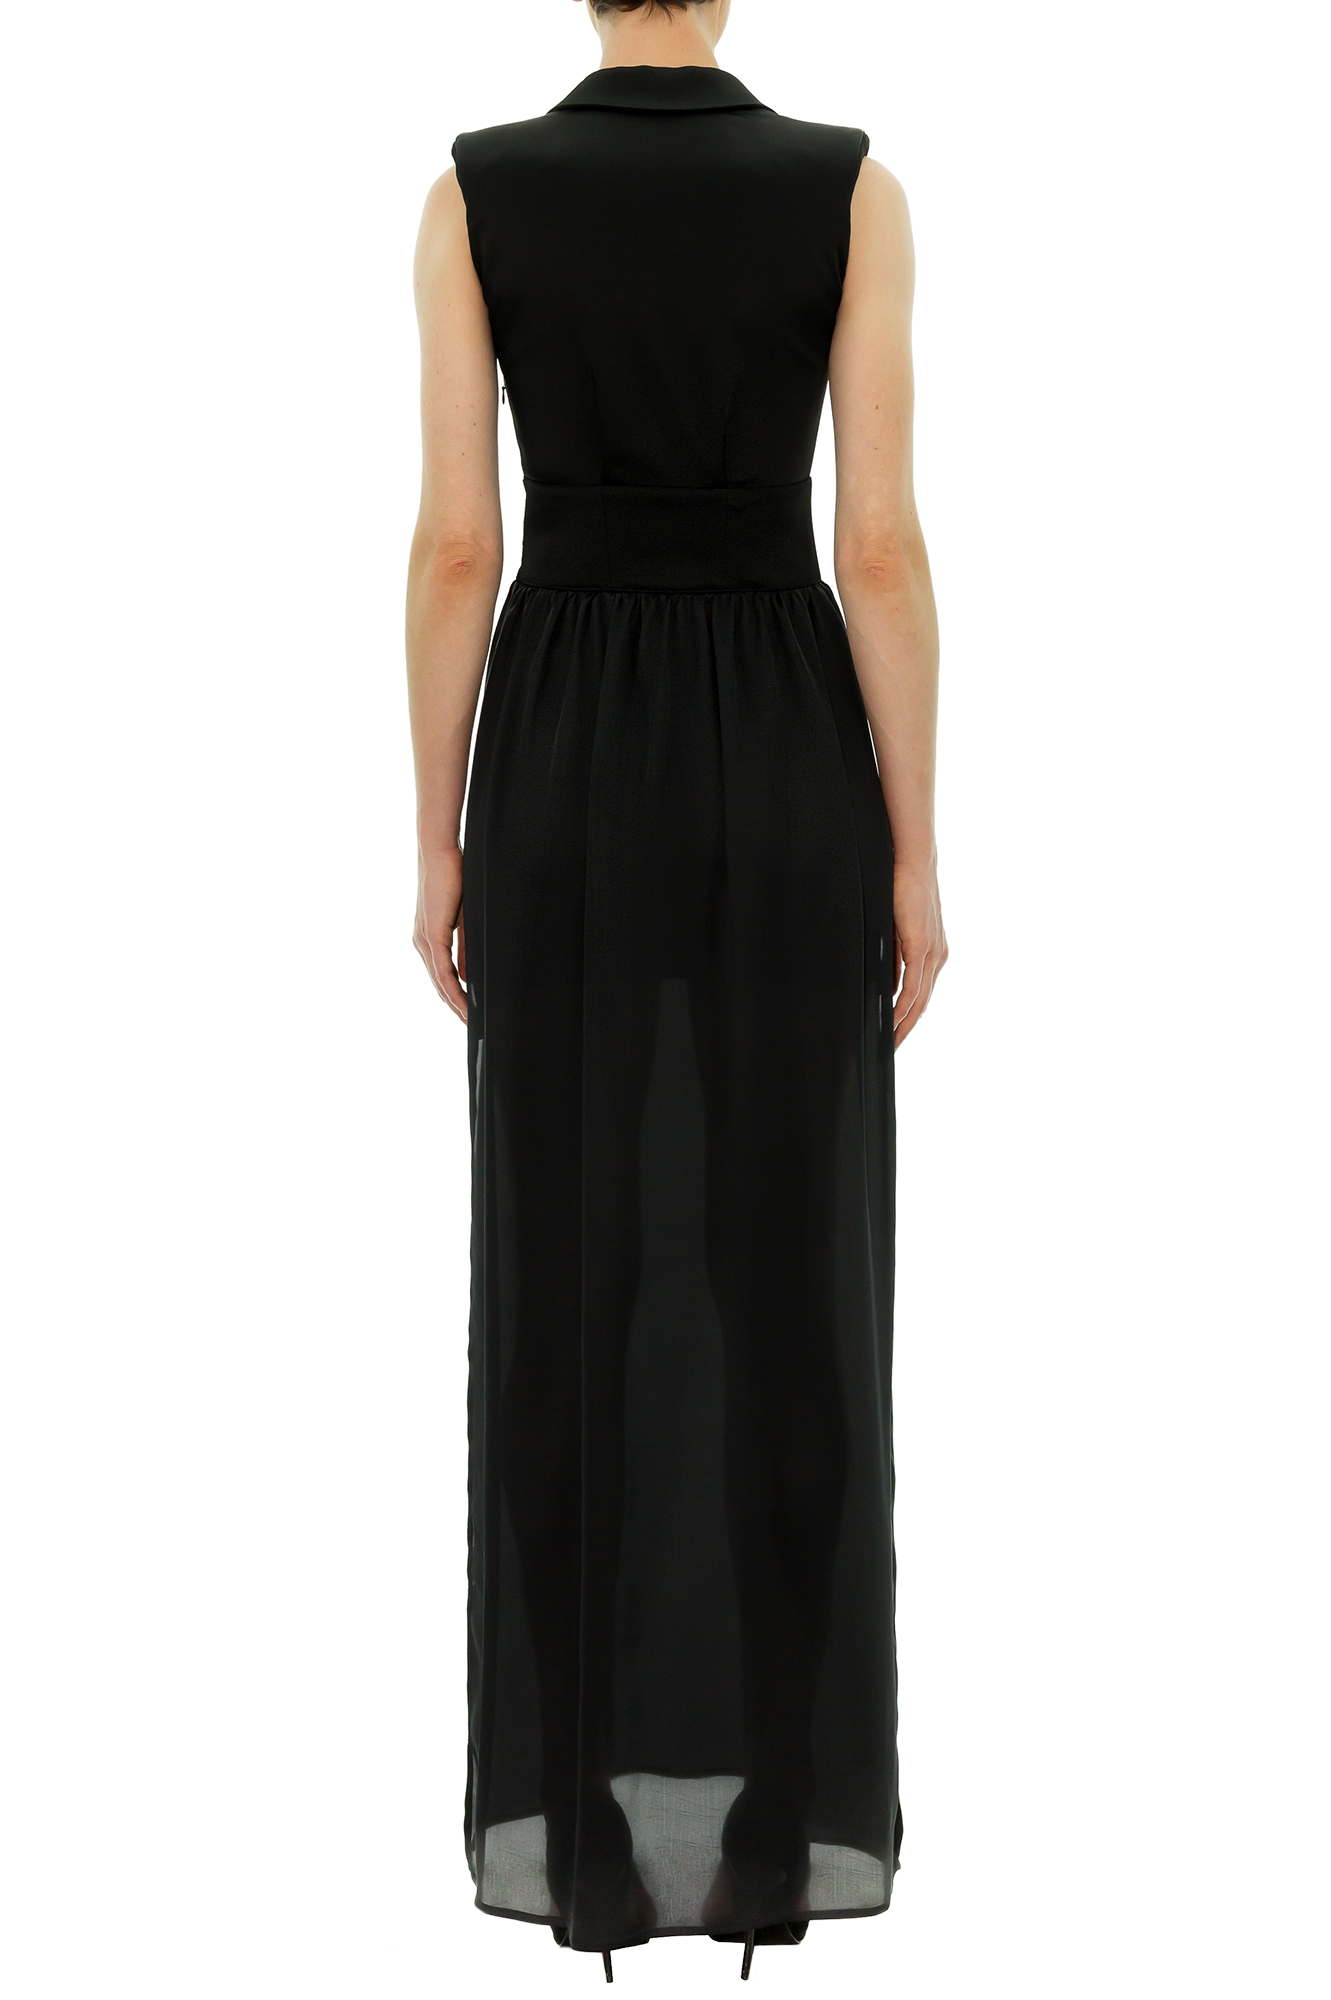 robe du soir robe longue robe noir stefanie renoma stefanie renoma. Black Bedroom Furniture Sets. Home Design Ideas